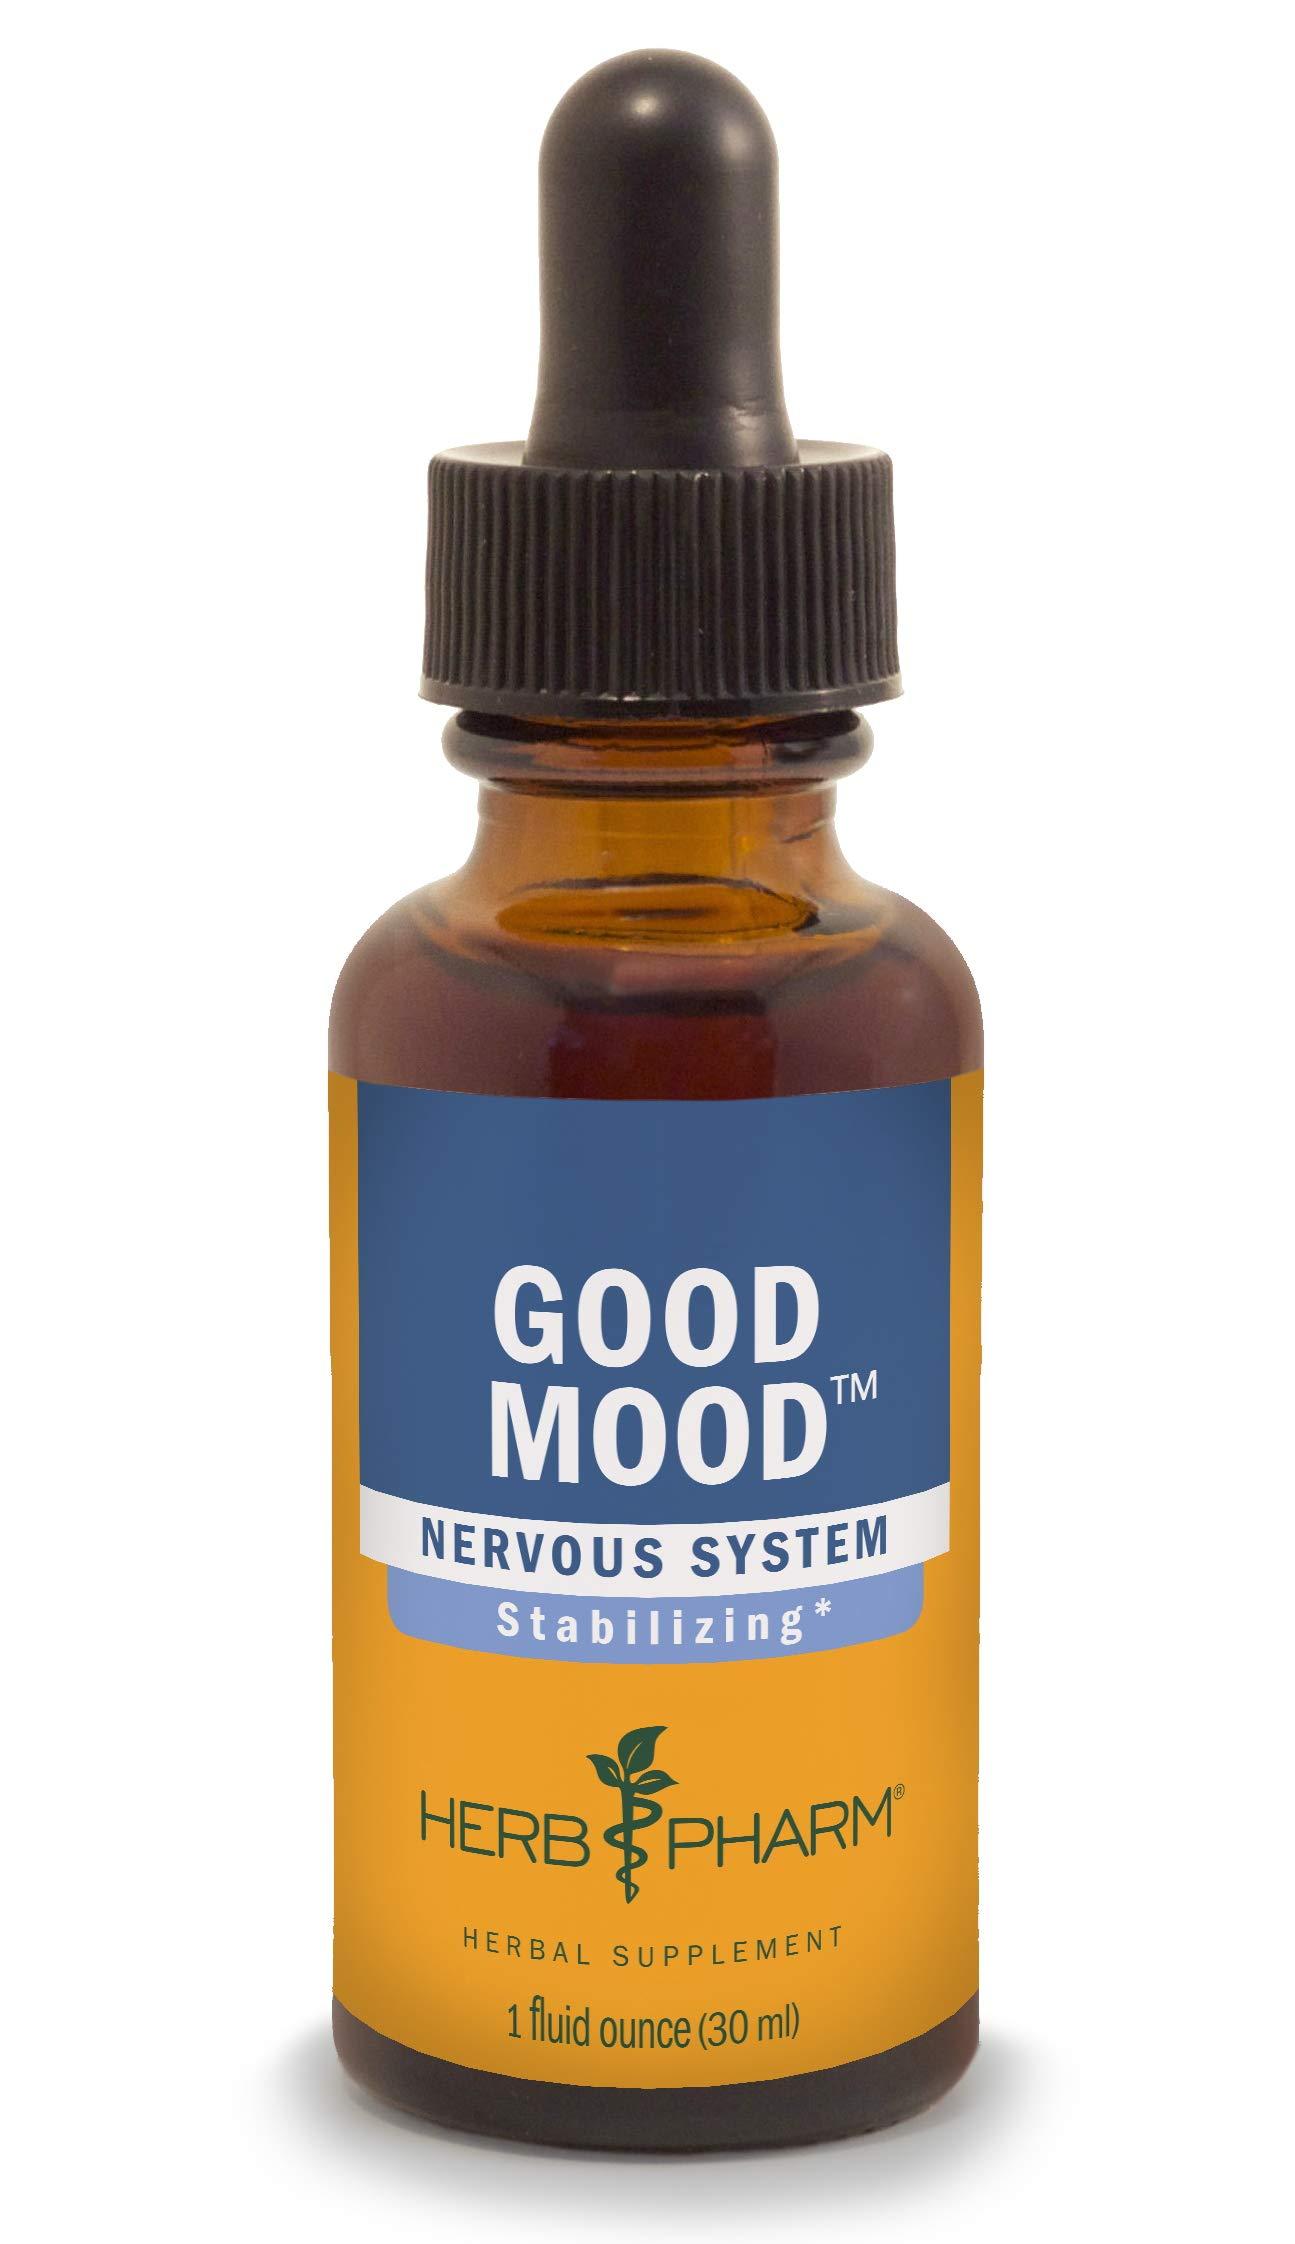 Herb Pharm Good Mood Liquid Herbal Formula with St. John's Wort for Healthy Emotional Balance - 1 Ounce by Herb Pharm